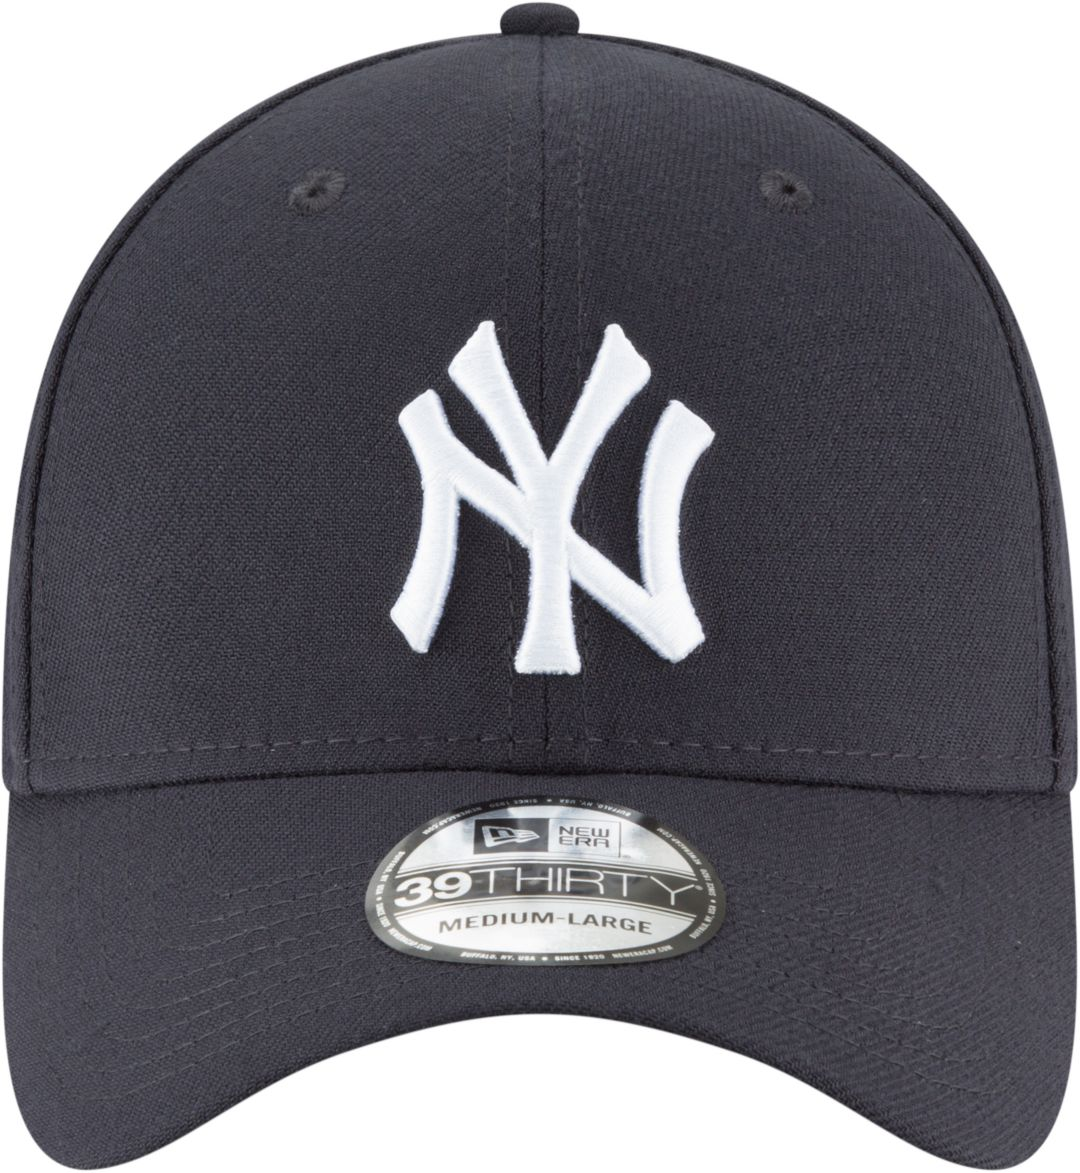 164c92396a14b3 New Era Men's New York Yankees 39Thirty Stretch Fit Hat w/ Italian ...